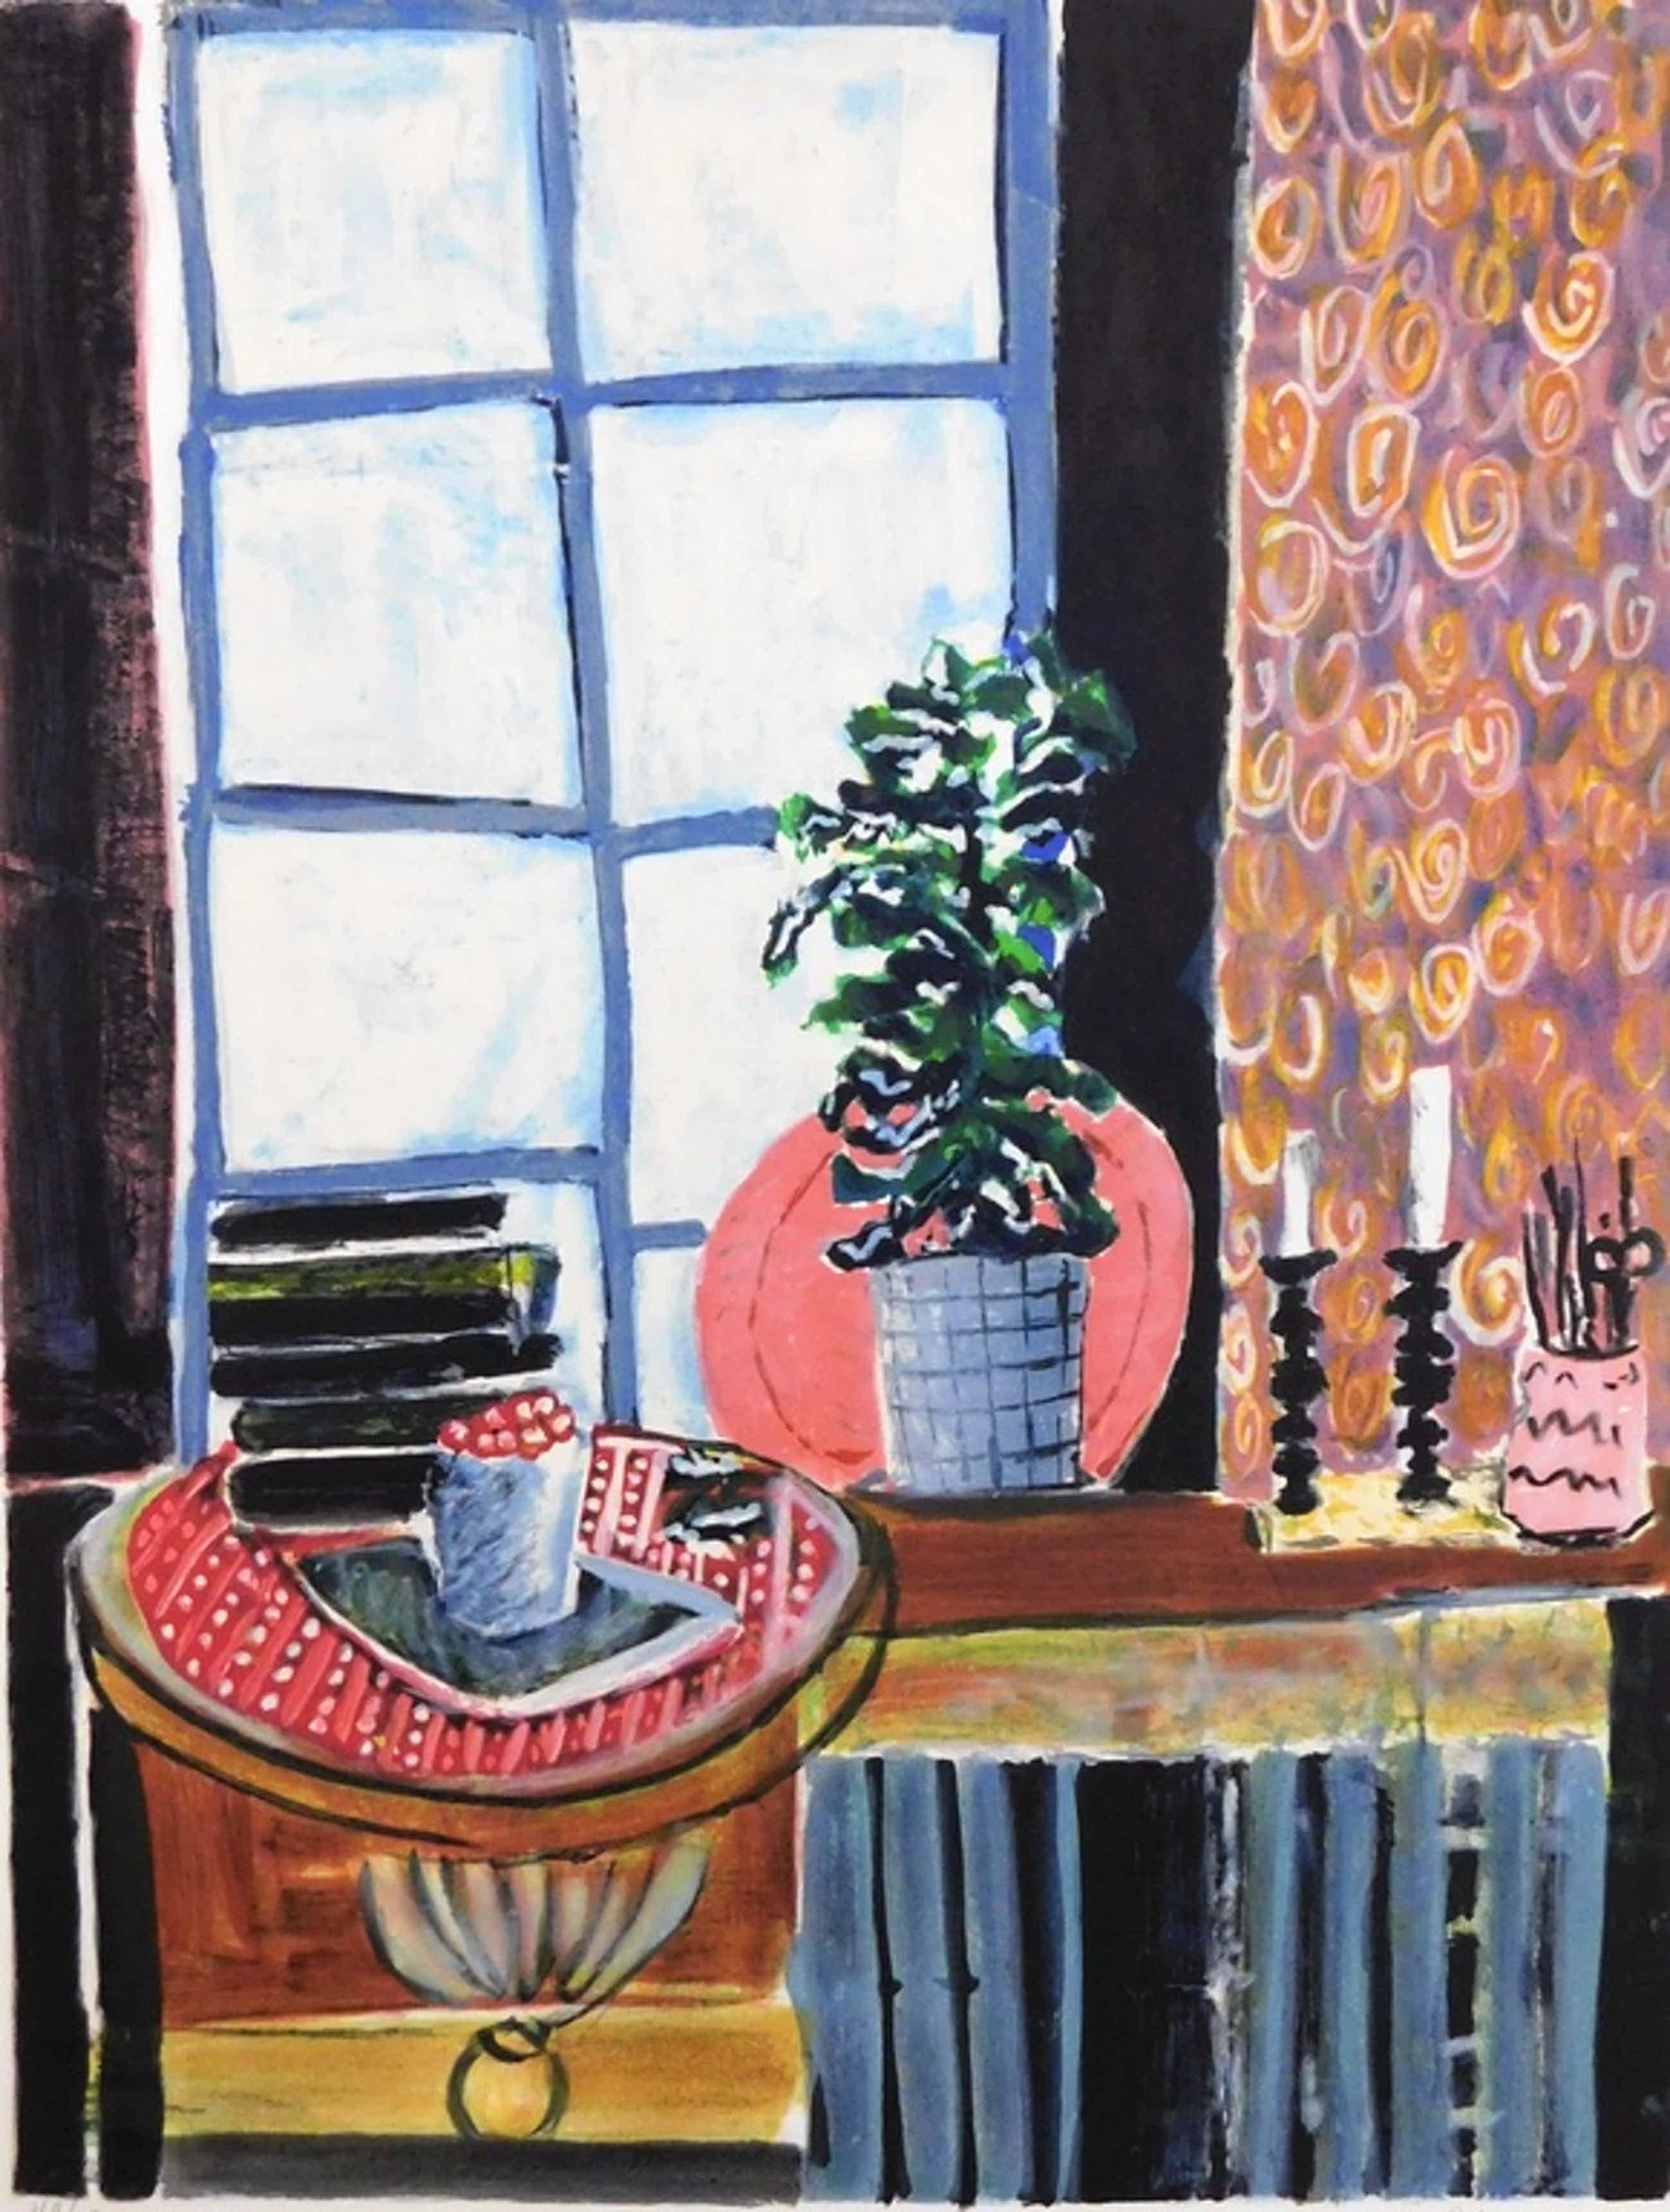 Wendy Chazin - kleurenlithografie - Still-life with Candlesticks kopen? Bied vanaf 40!